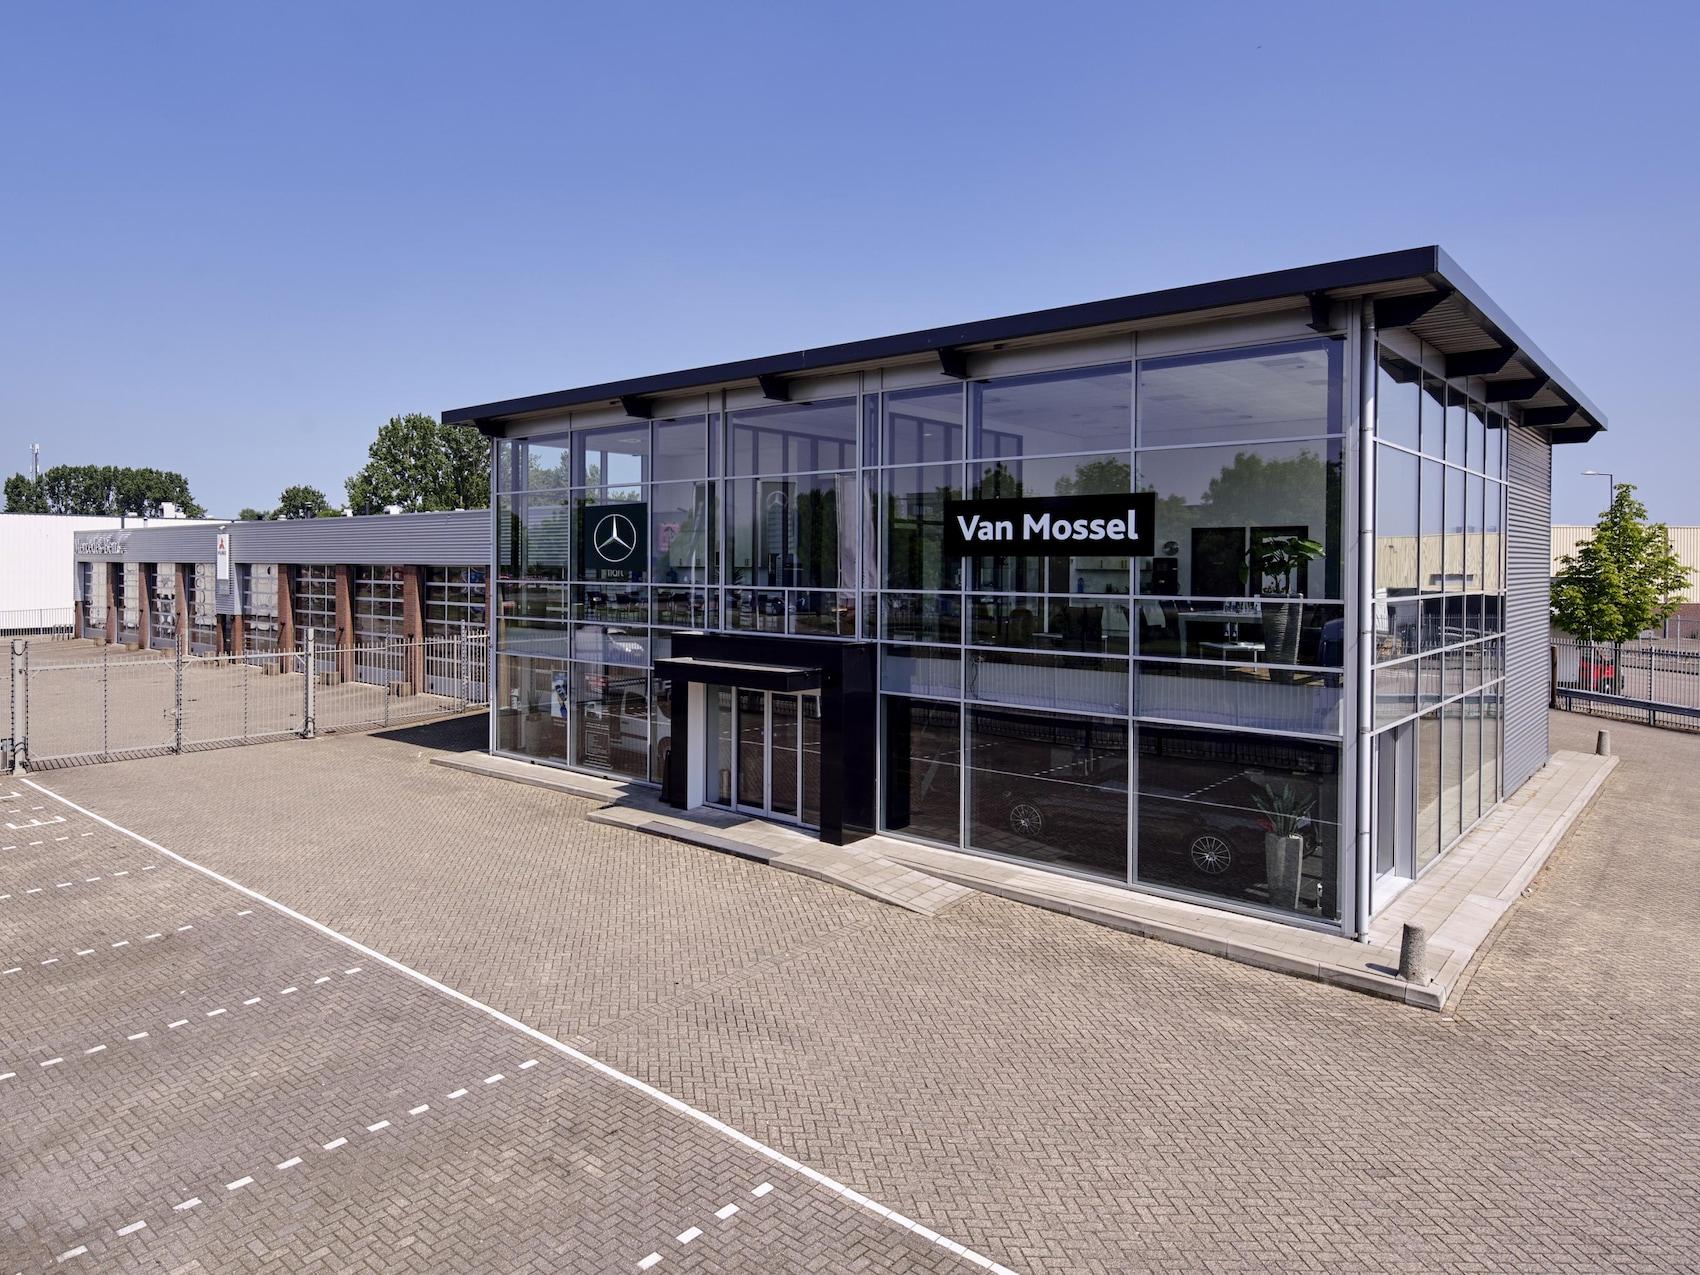 Vestiging_Van Mossel smart_Rotterdam Spaanse Polder